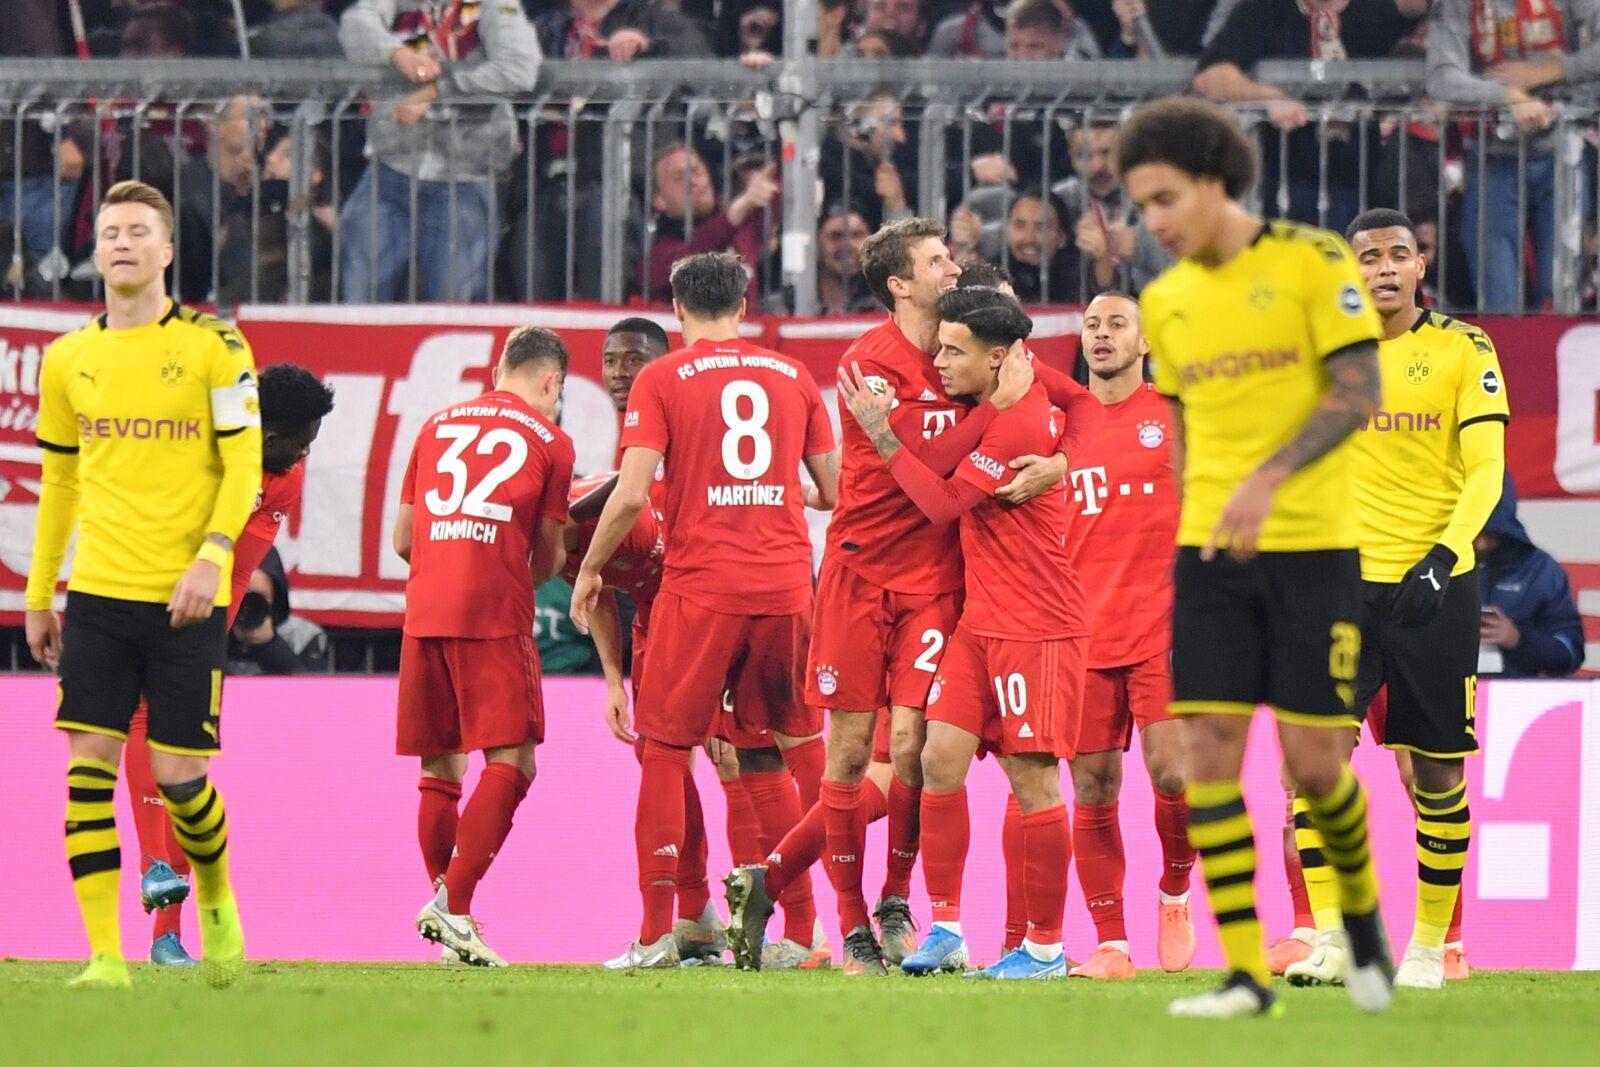 Bayern & Dortmund Interested in Signing Milan Full Back as ...  |Bayern-dortmund